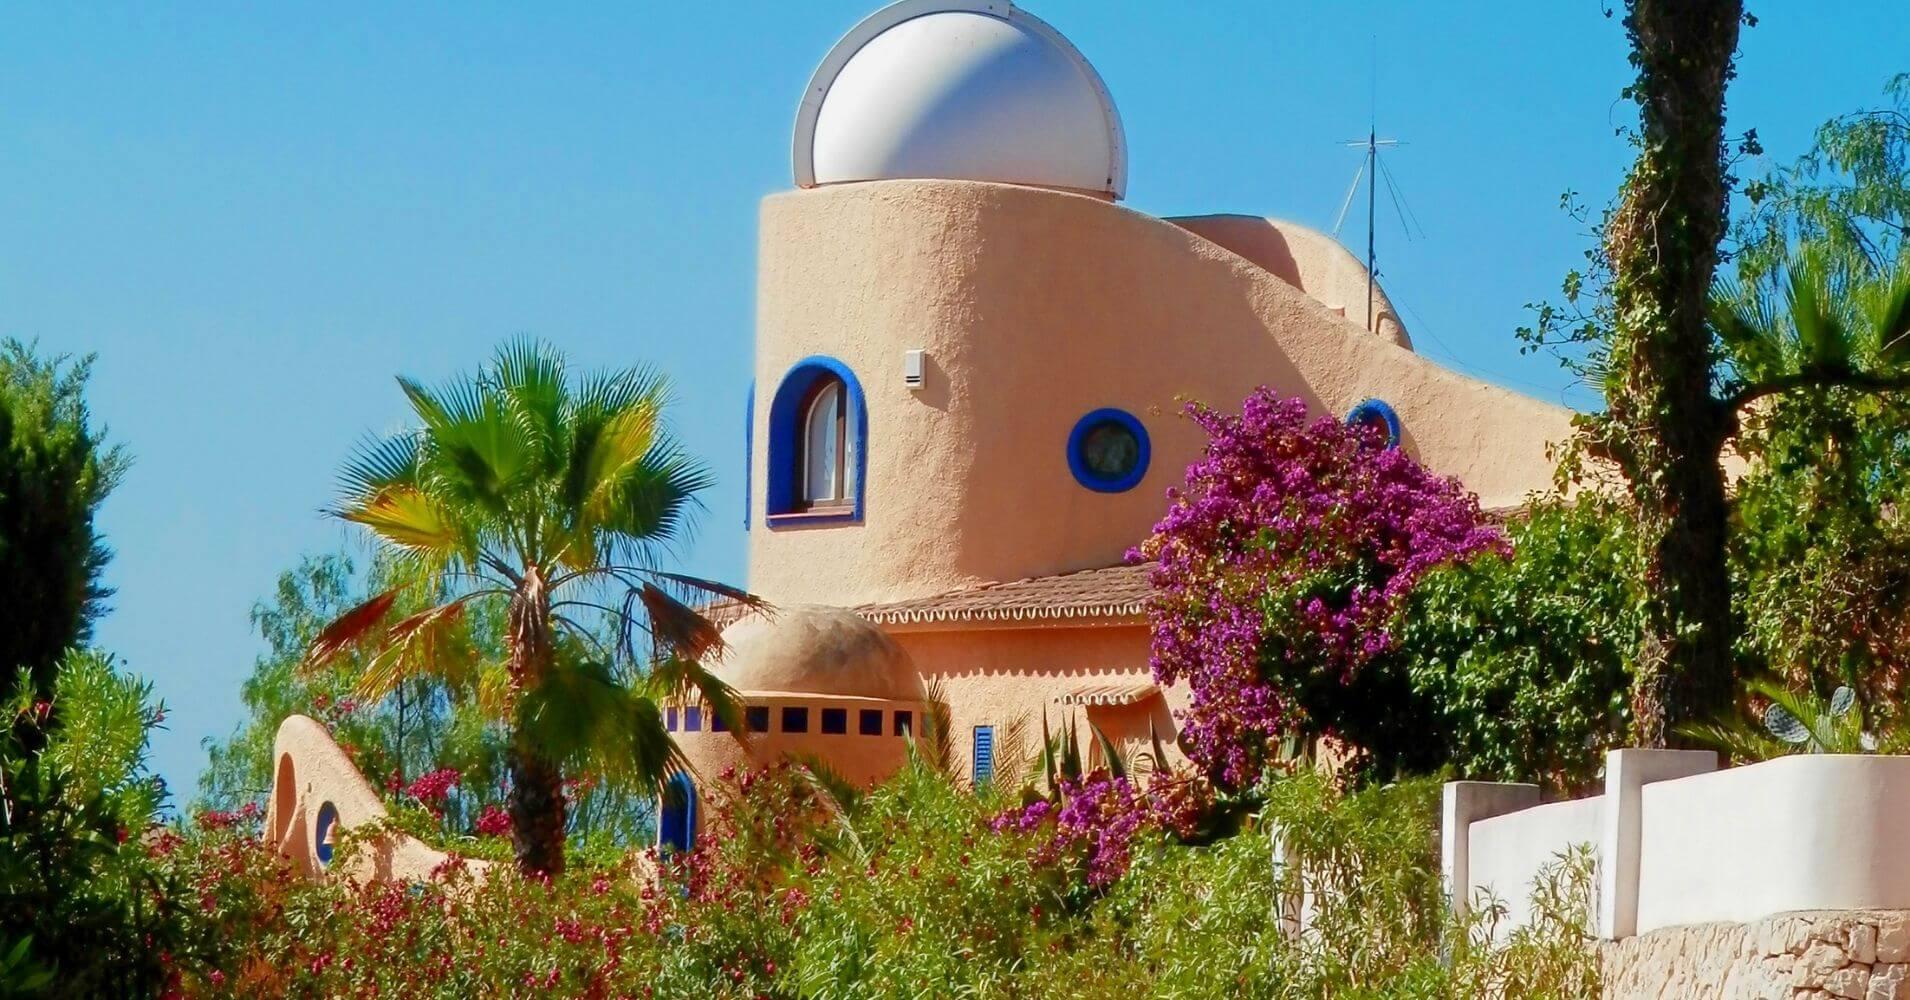 Observatorio de Cap Blac. Cap d' Or, Moraira. Alicante. Comunidad Valenciana.